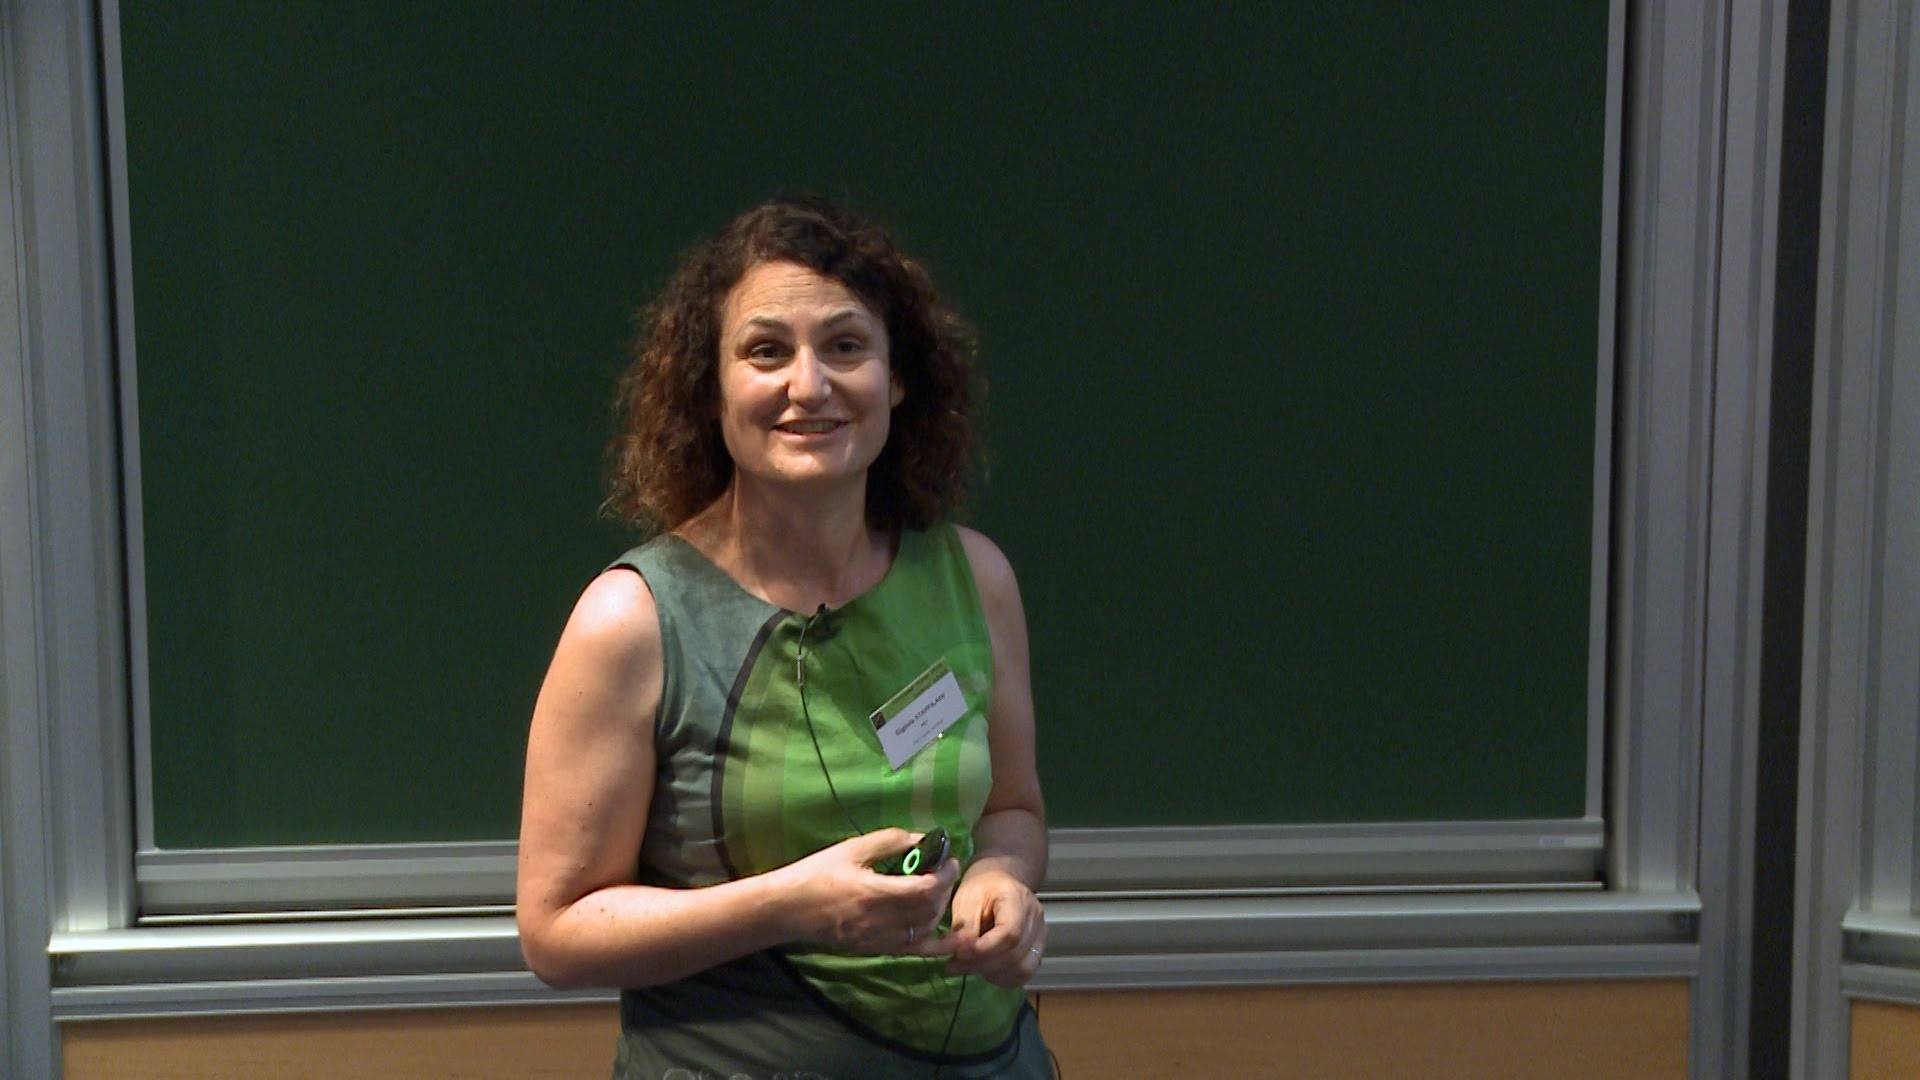 Gigliola Staffilani è l'EMS lecturer 2018, e sarà a Roma Tor Vergata dal 16 al 18 luglio